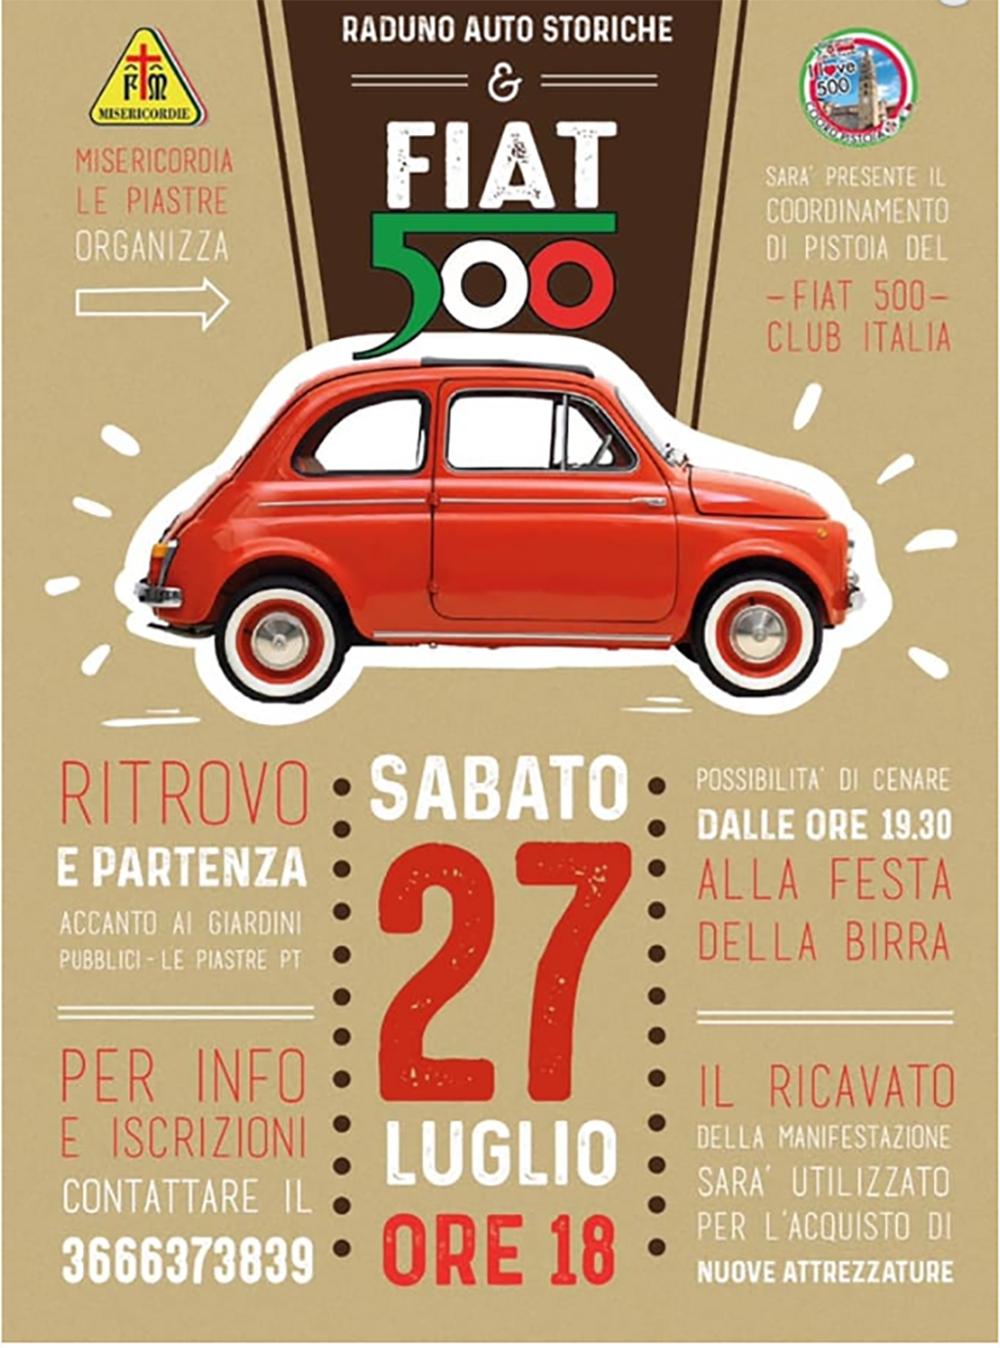 Fiat 500 in raduno